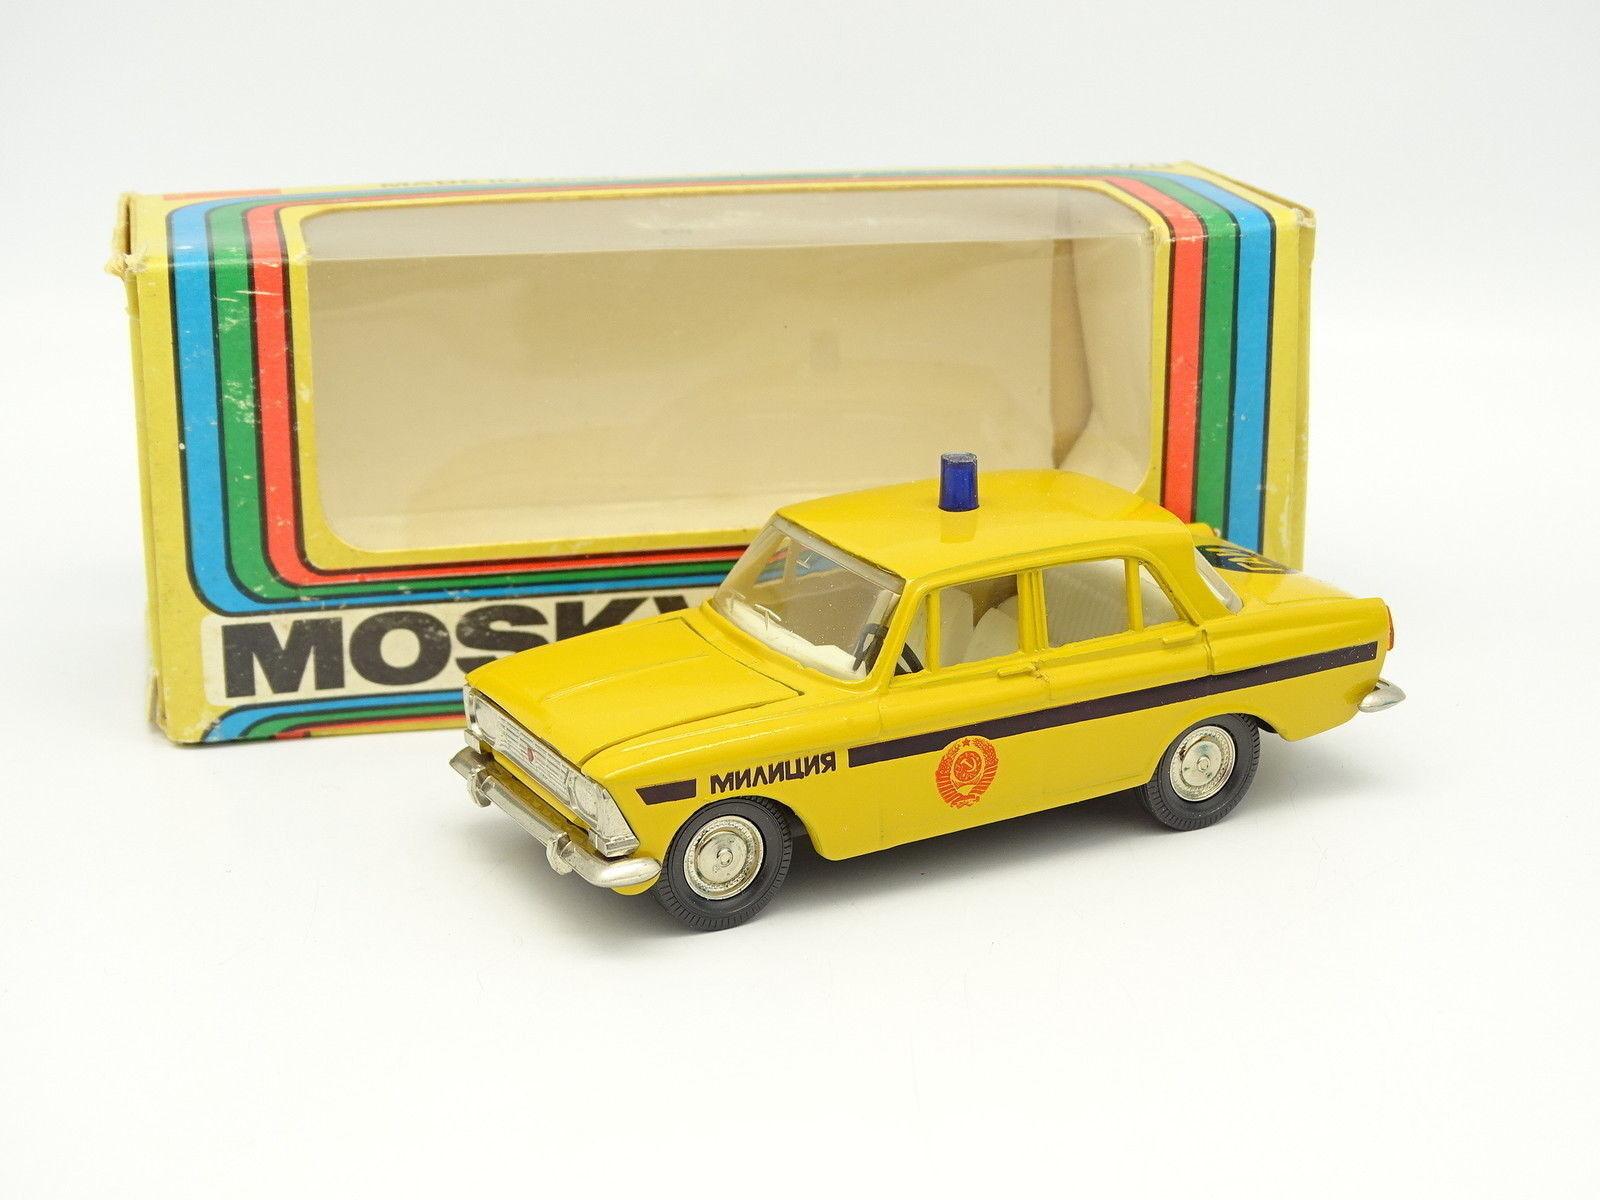 USSR Saratov 1 43 - Moskvitch Lada 412 Police (Policía)